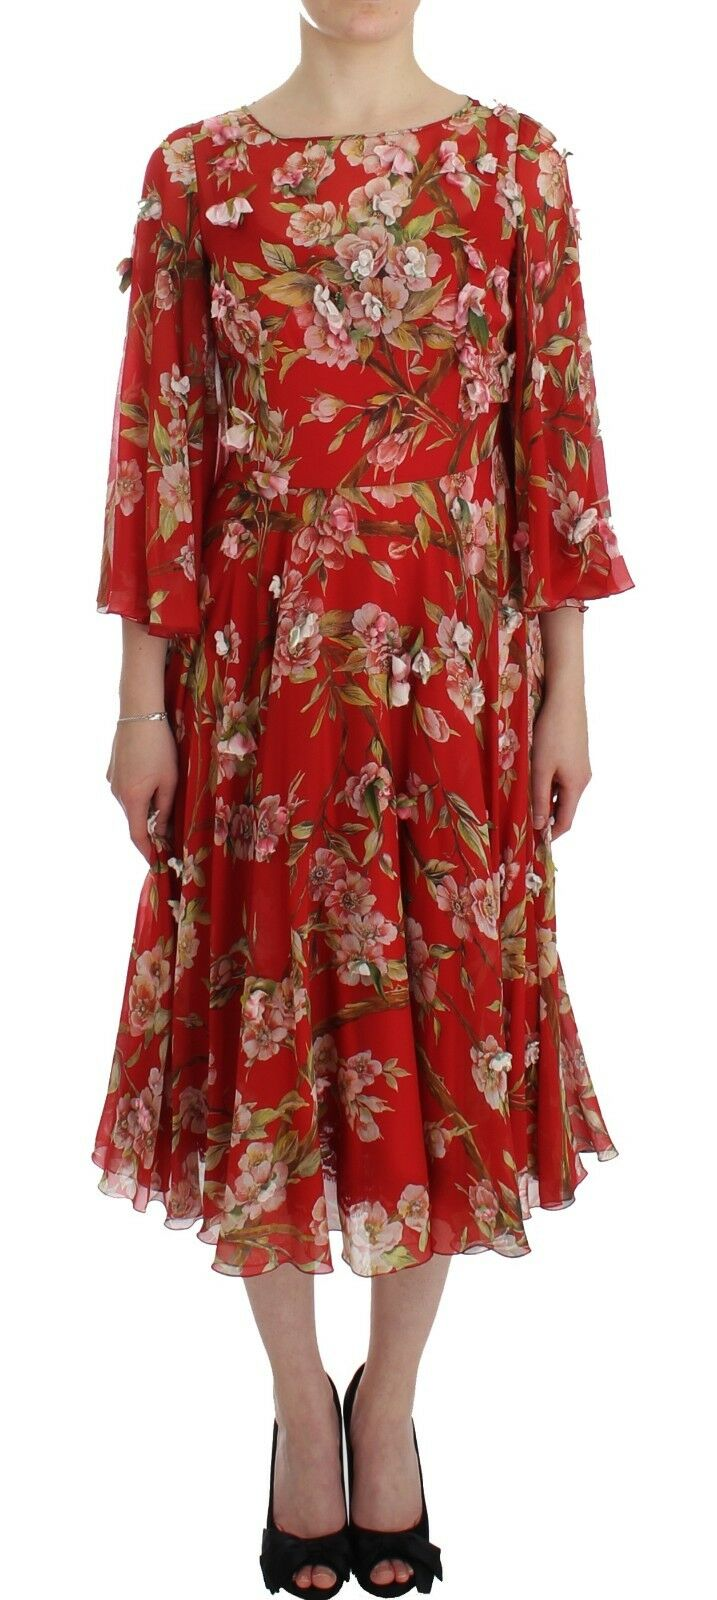 Dolce & Gabbana Women's Floral Print Silk Runway Dress Red SIG12488 - IT42|M